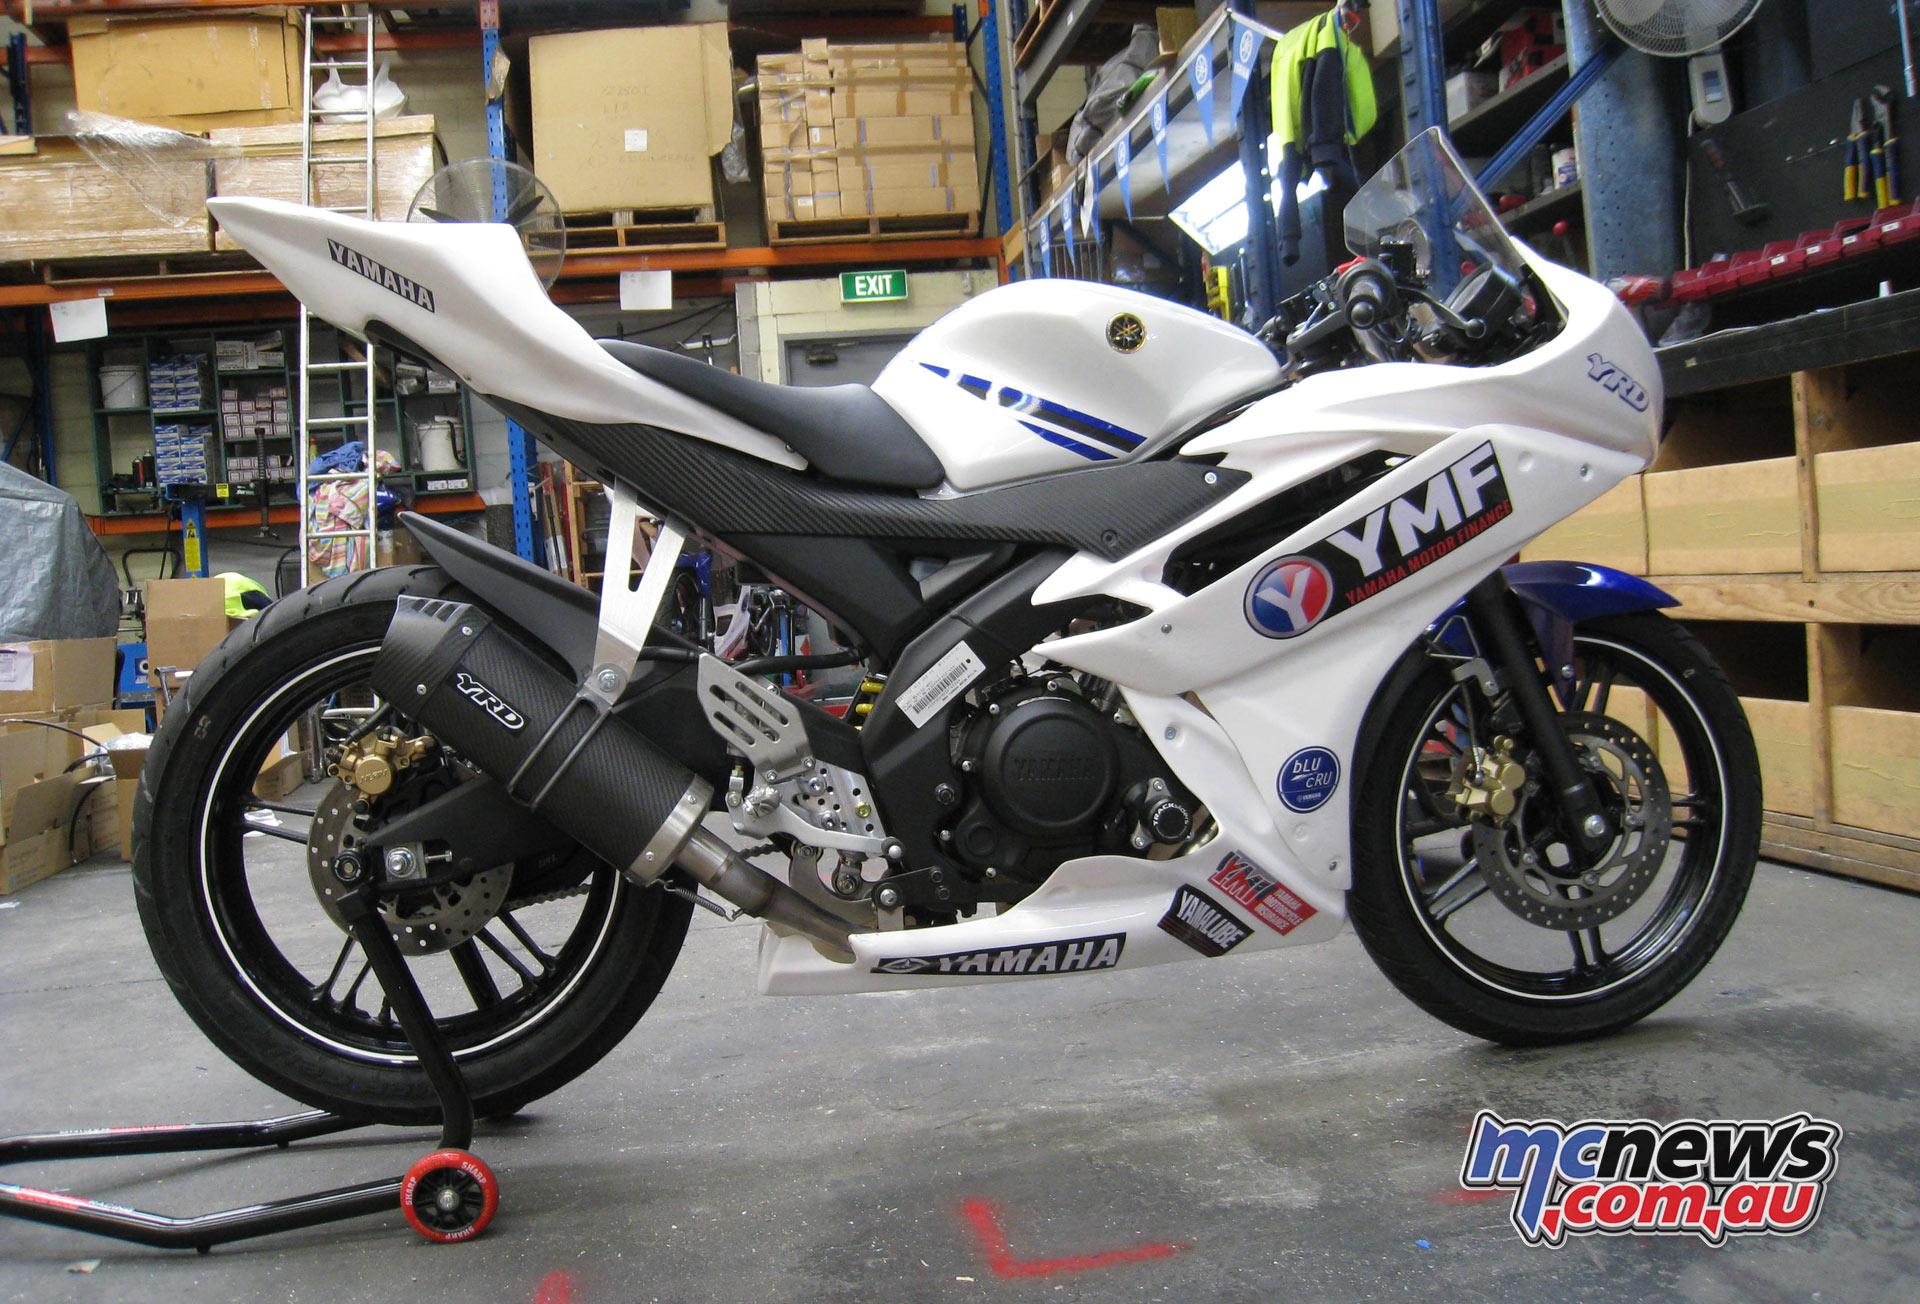 GP Juniors 2017 YZF-R15 competition bike